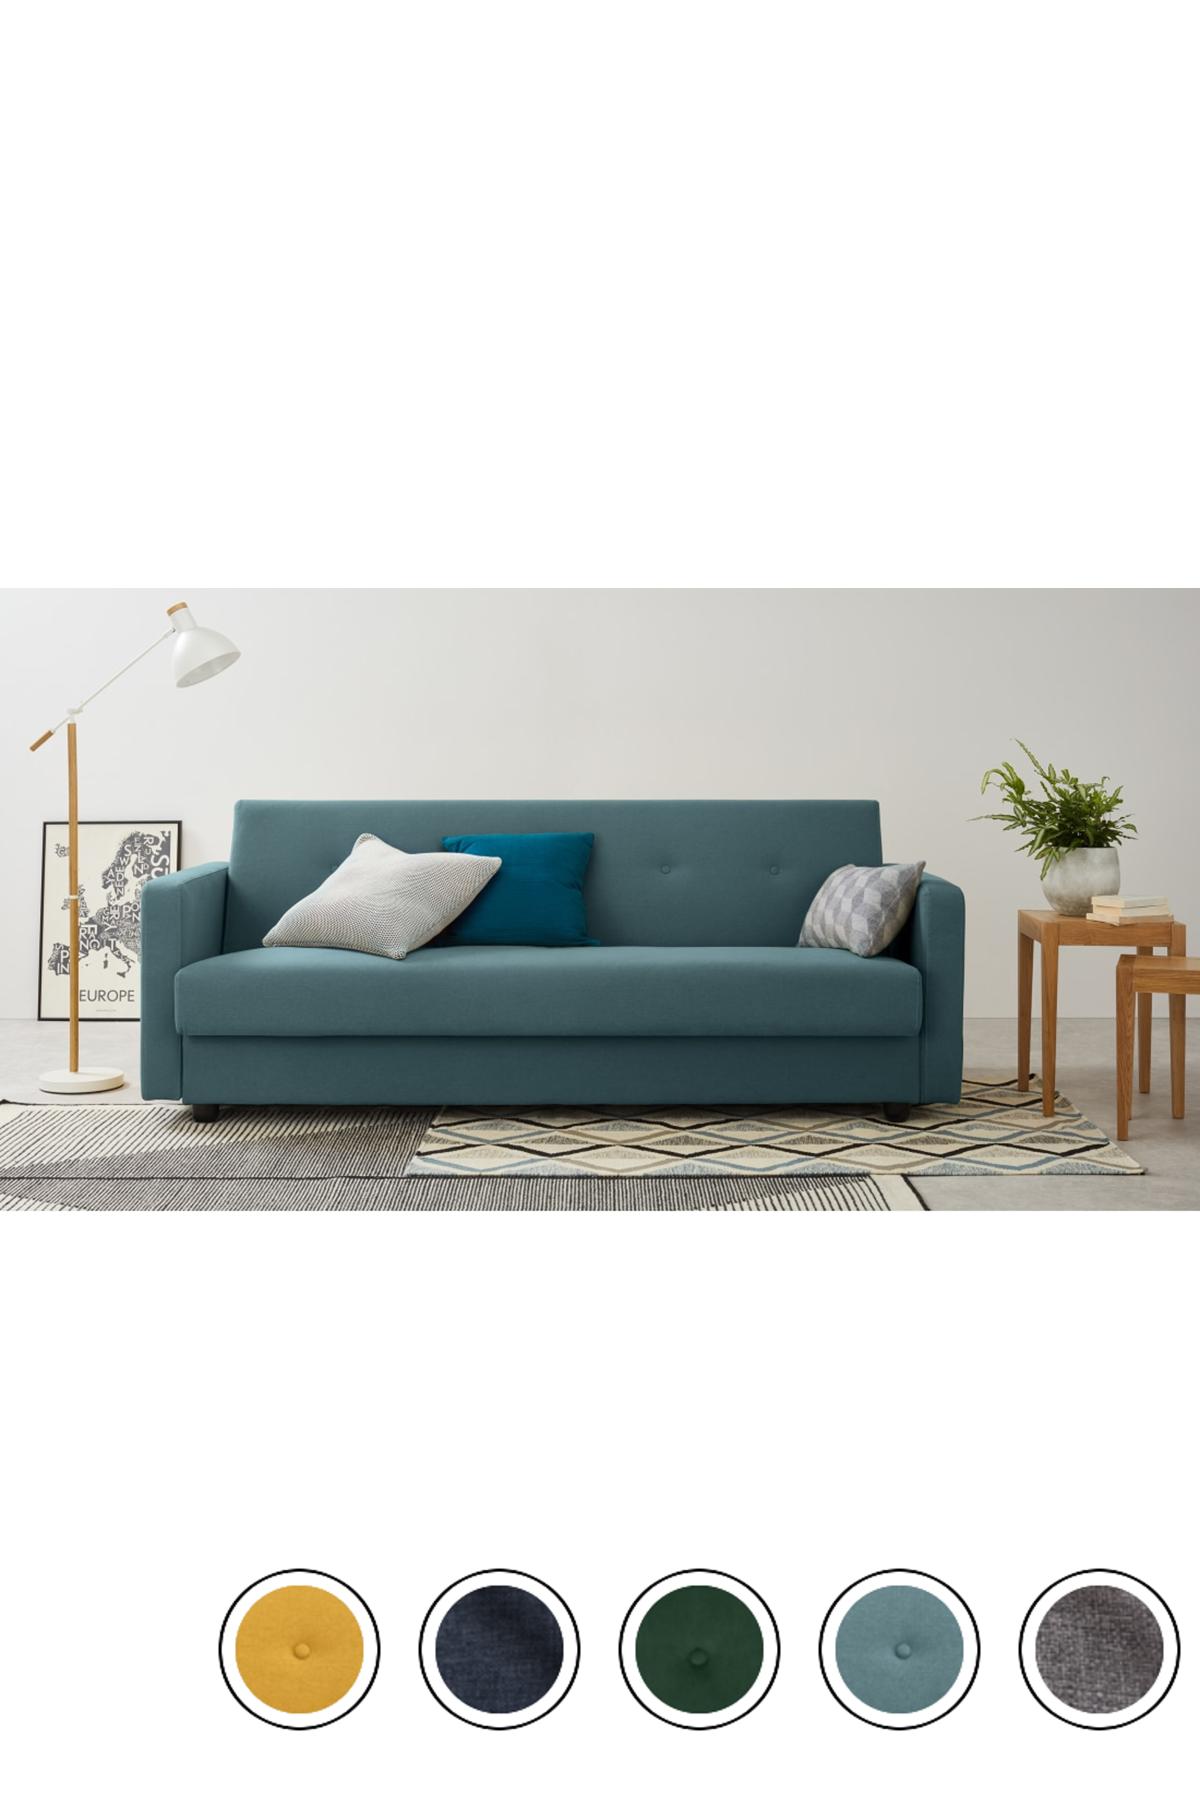 Sherbet Blue Sofa Bed